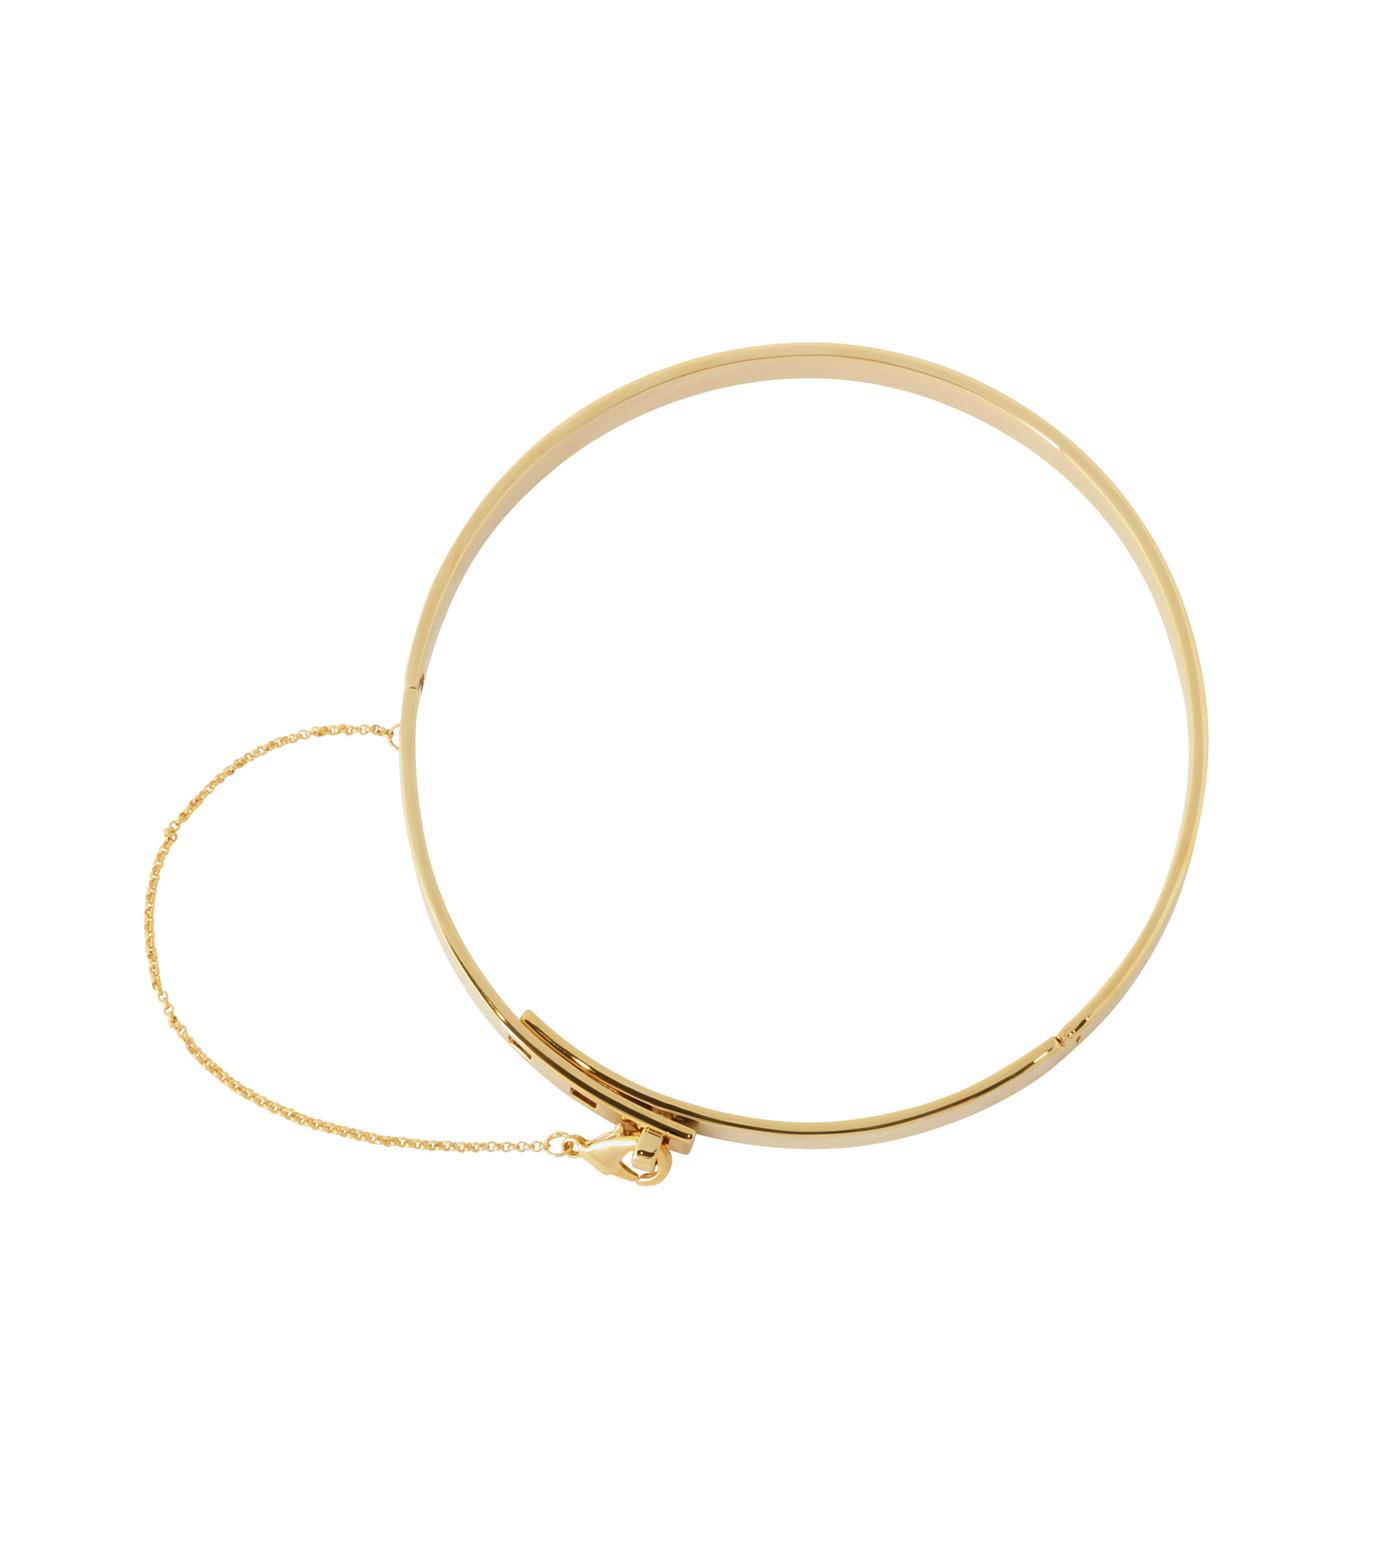 Eddie Borgo(エディ・ボルゴ)のSMALL SAFTY CHAIN CHOKER-GOLD(ネックレス/necklace)-CK1003-R-2 拡大詳細画像3